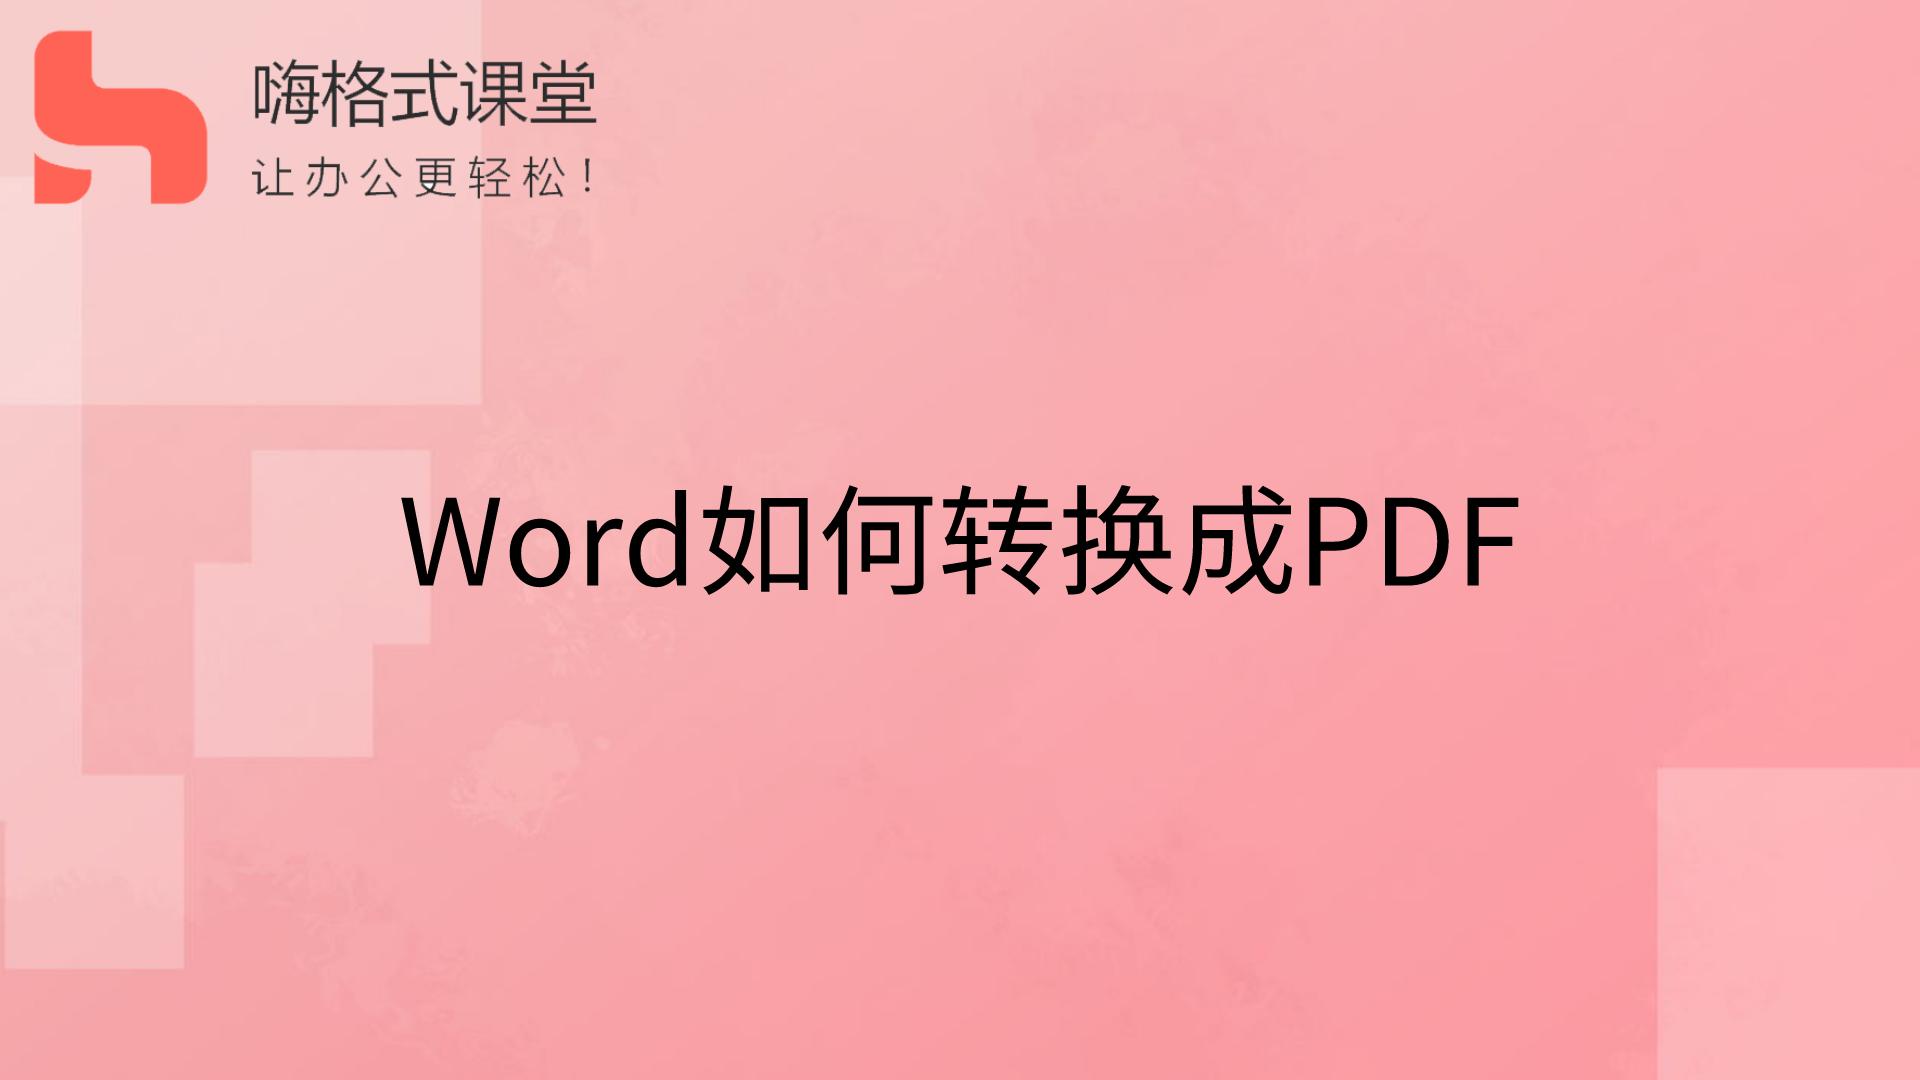 Word如何转换成PDFs